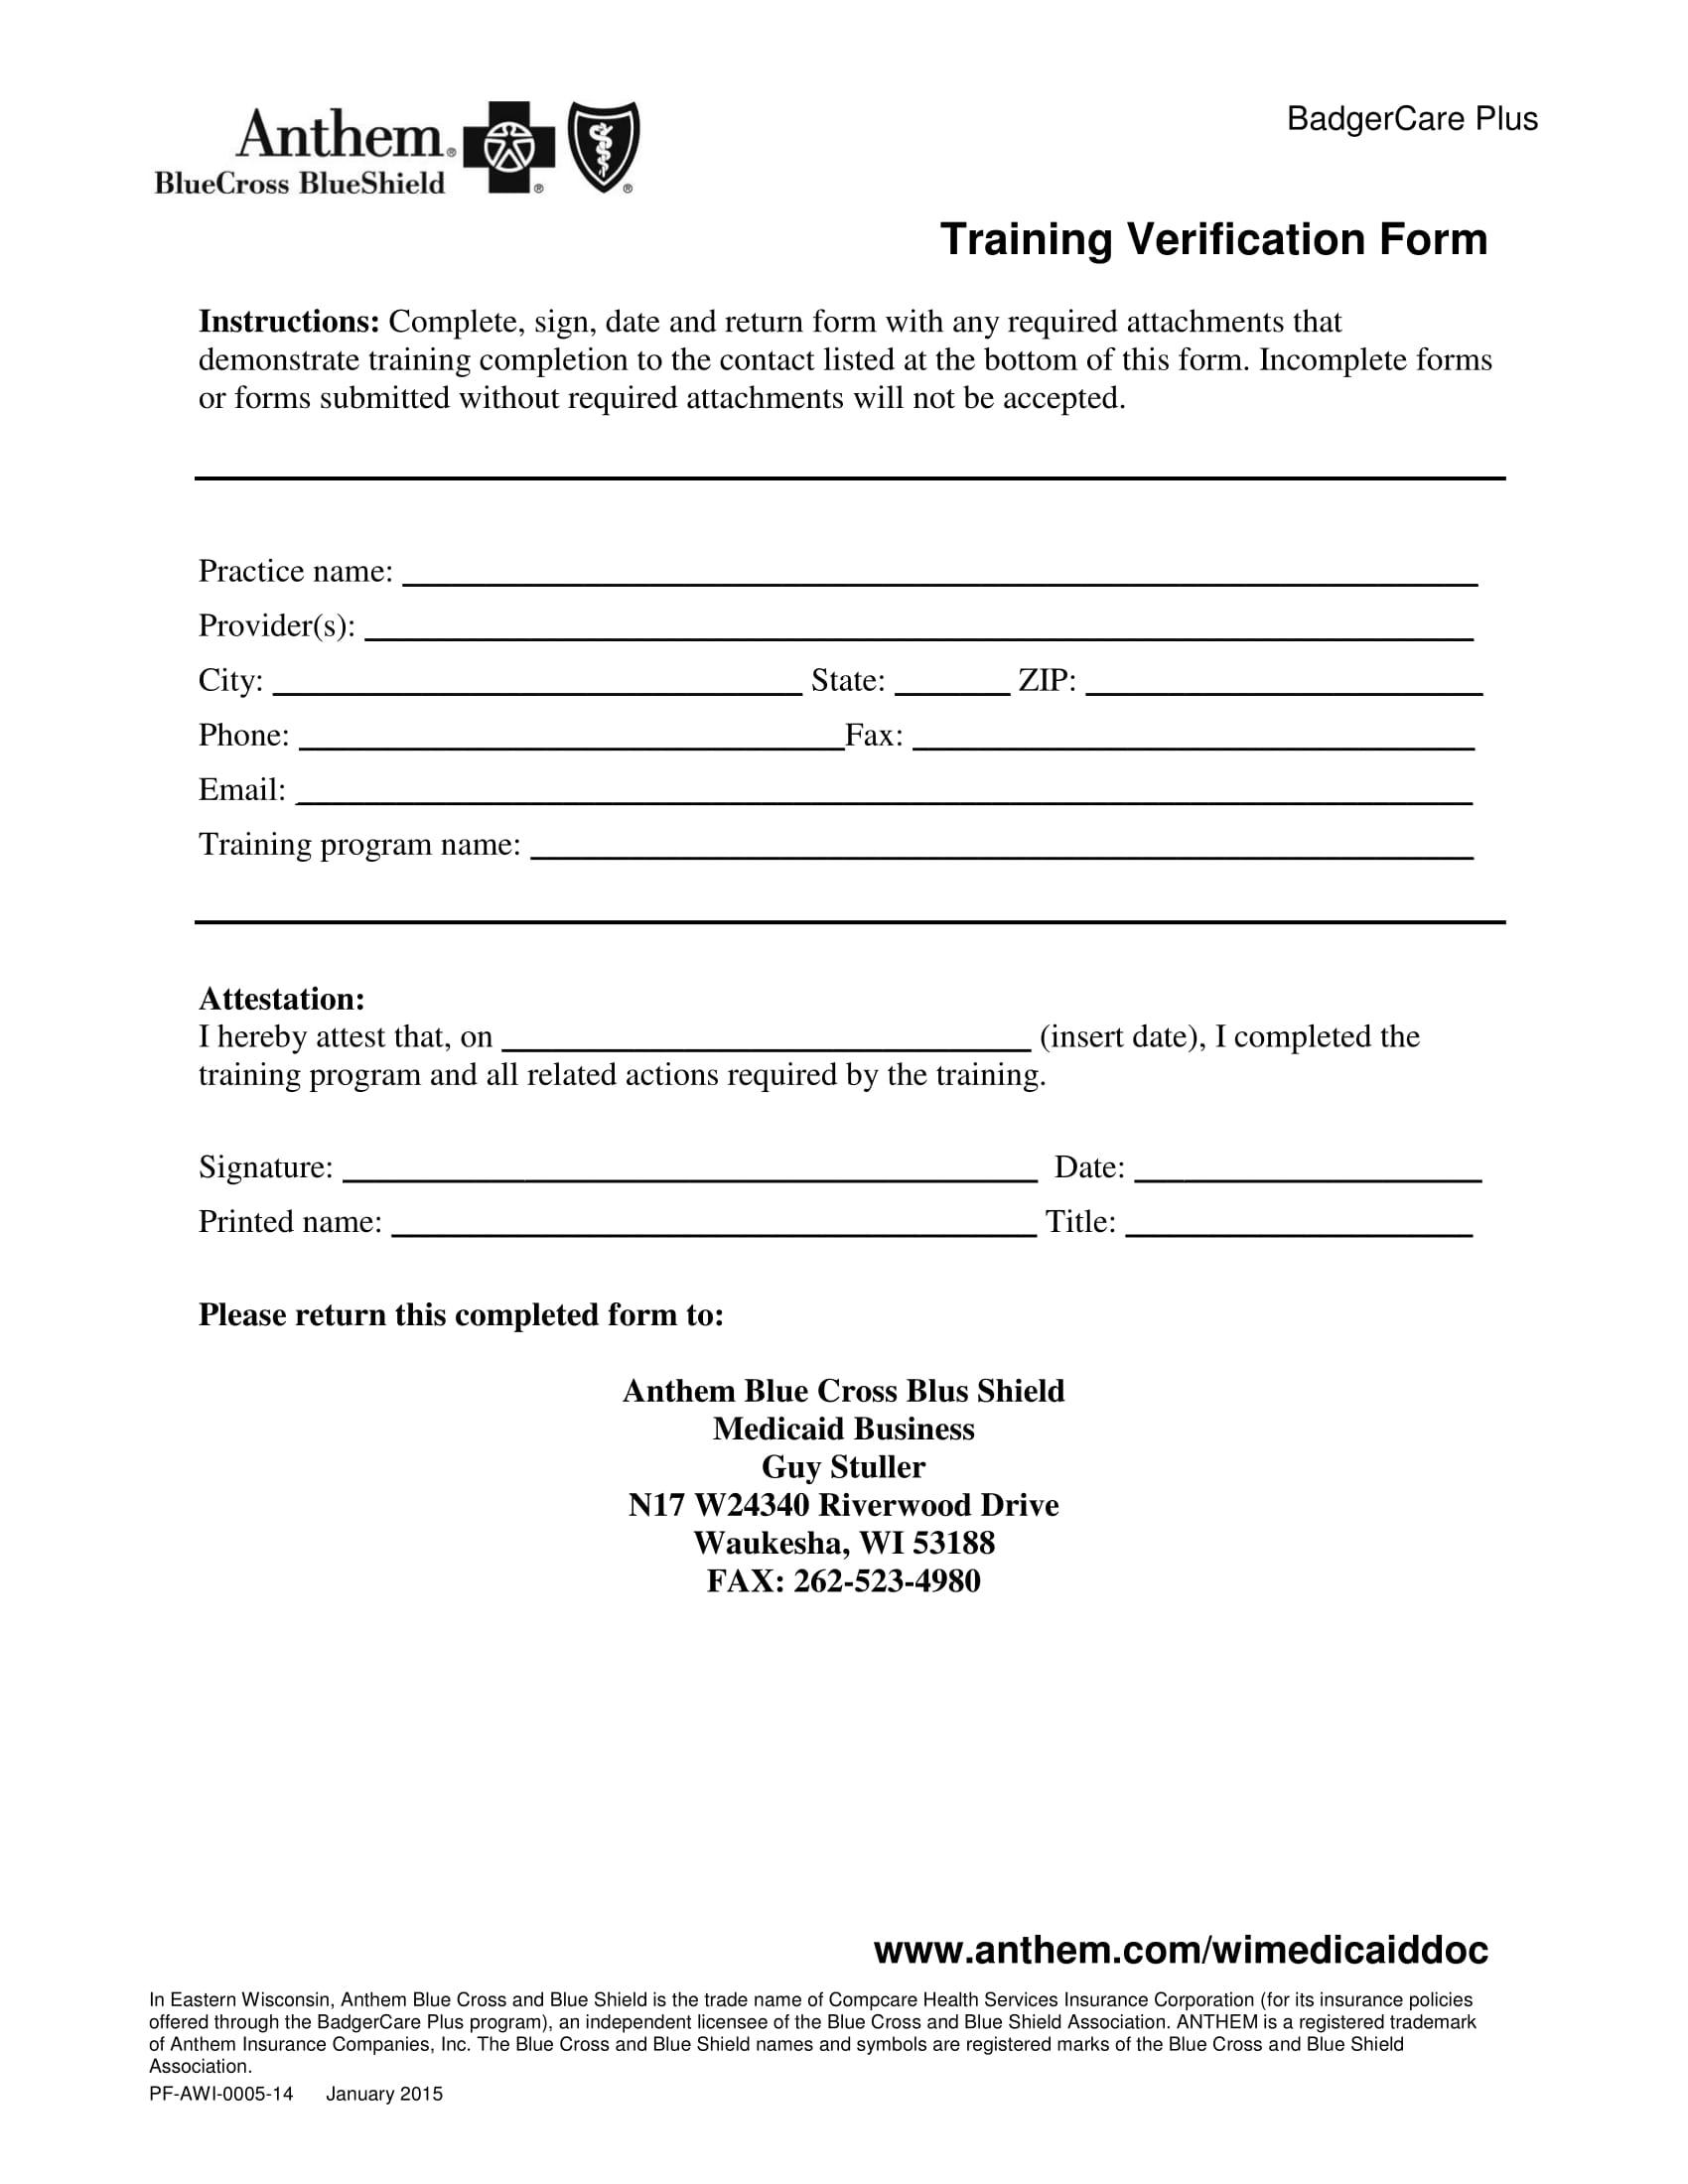 medical training verification form 1